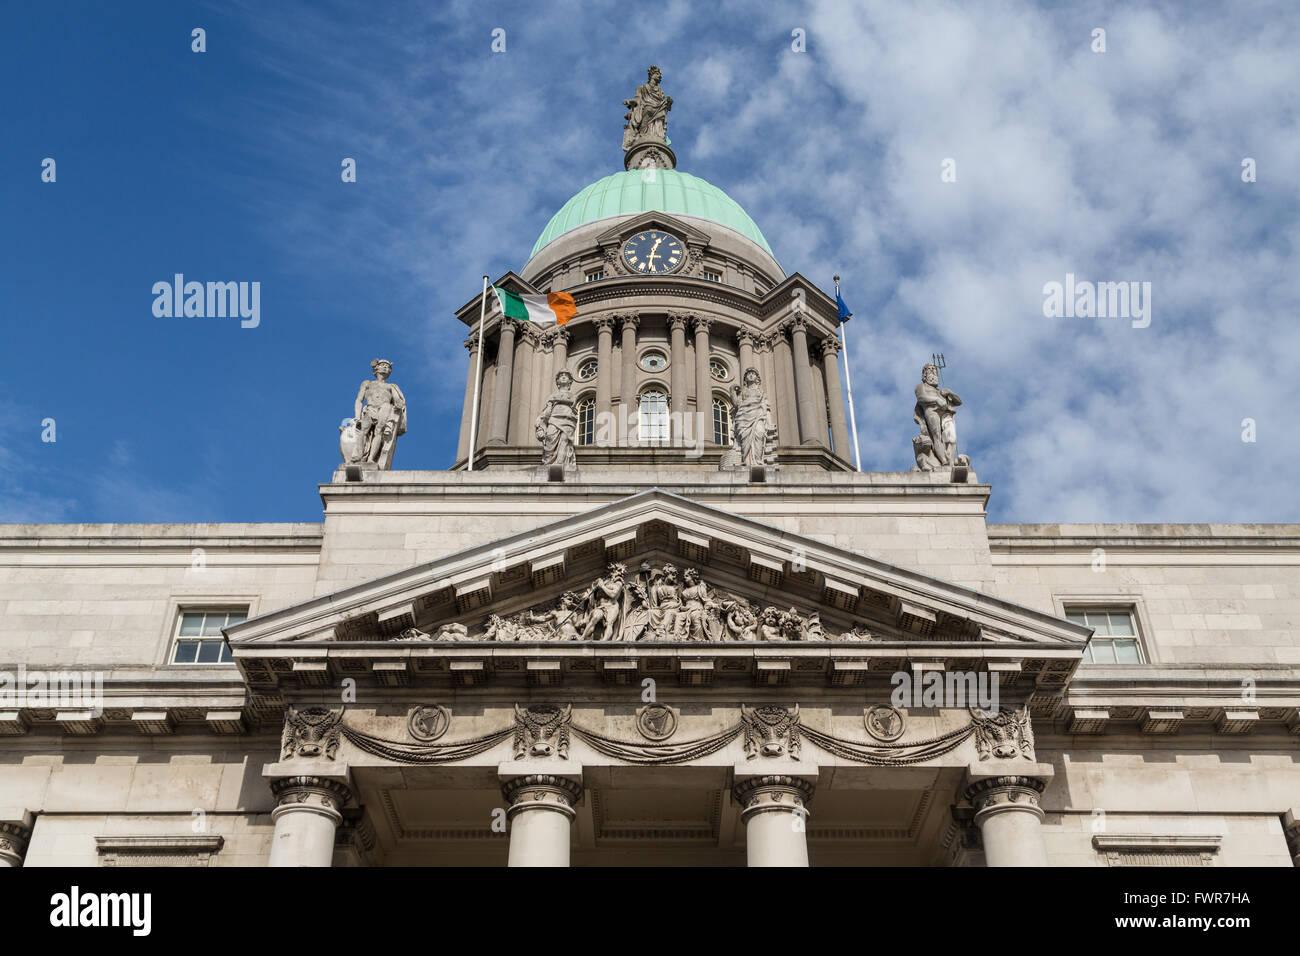 Custom House, Liffey bank, Dublin, Ireland - Stock Image